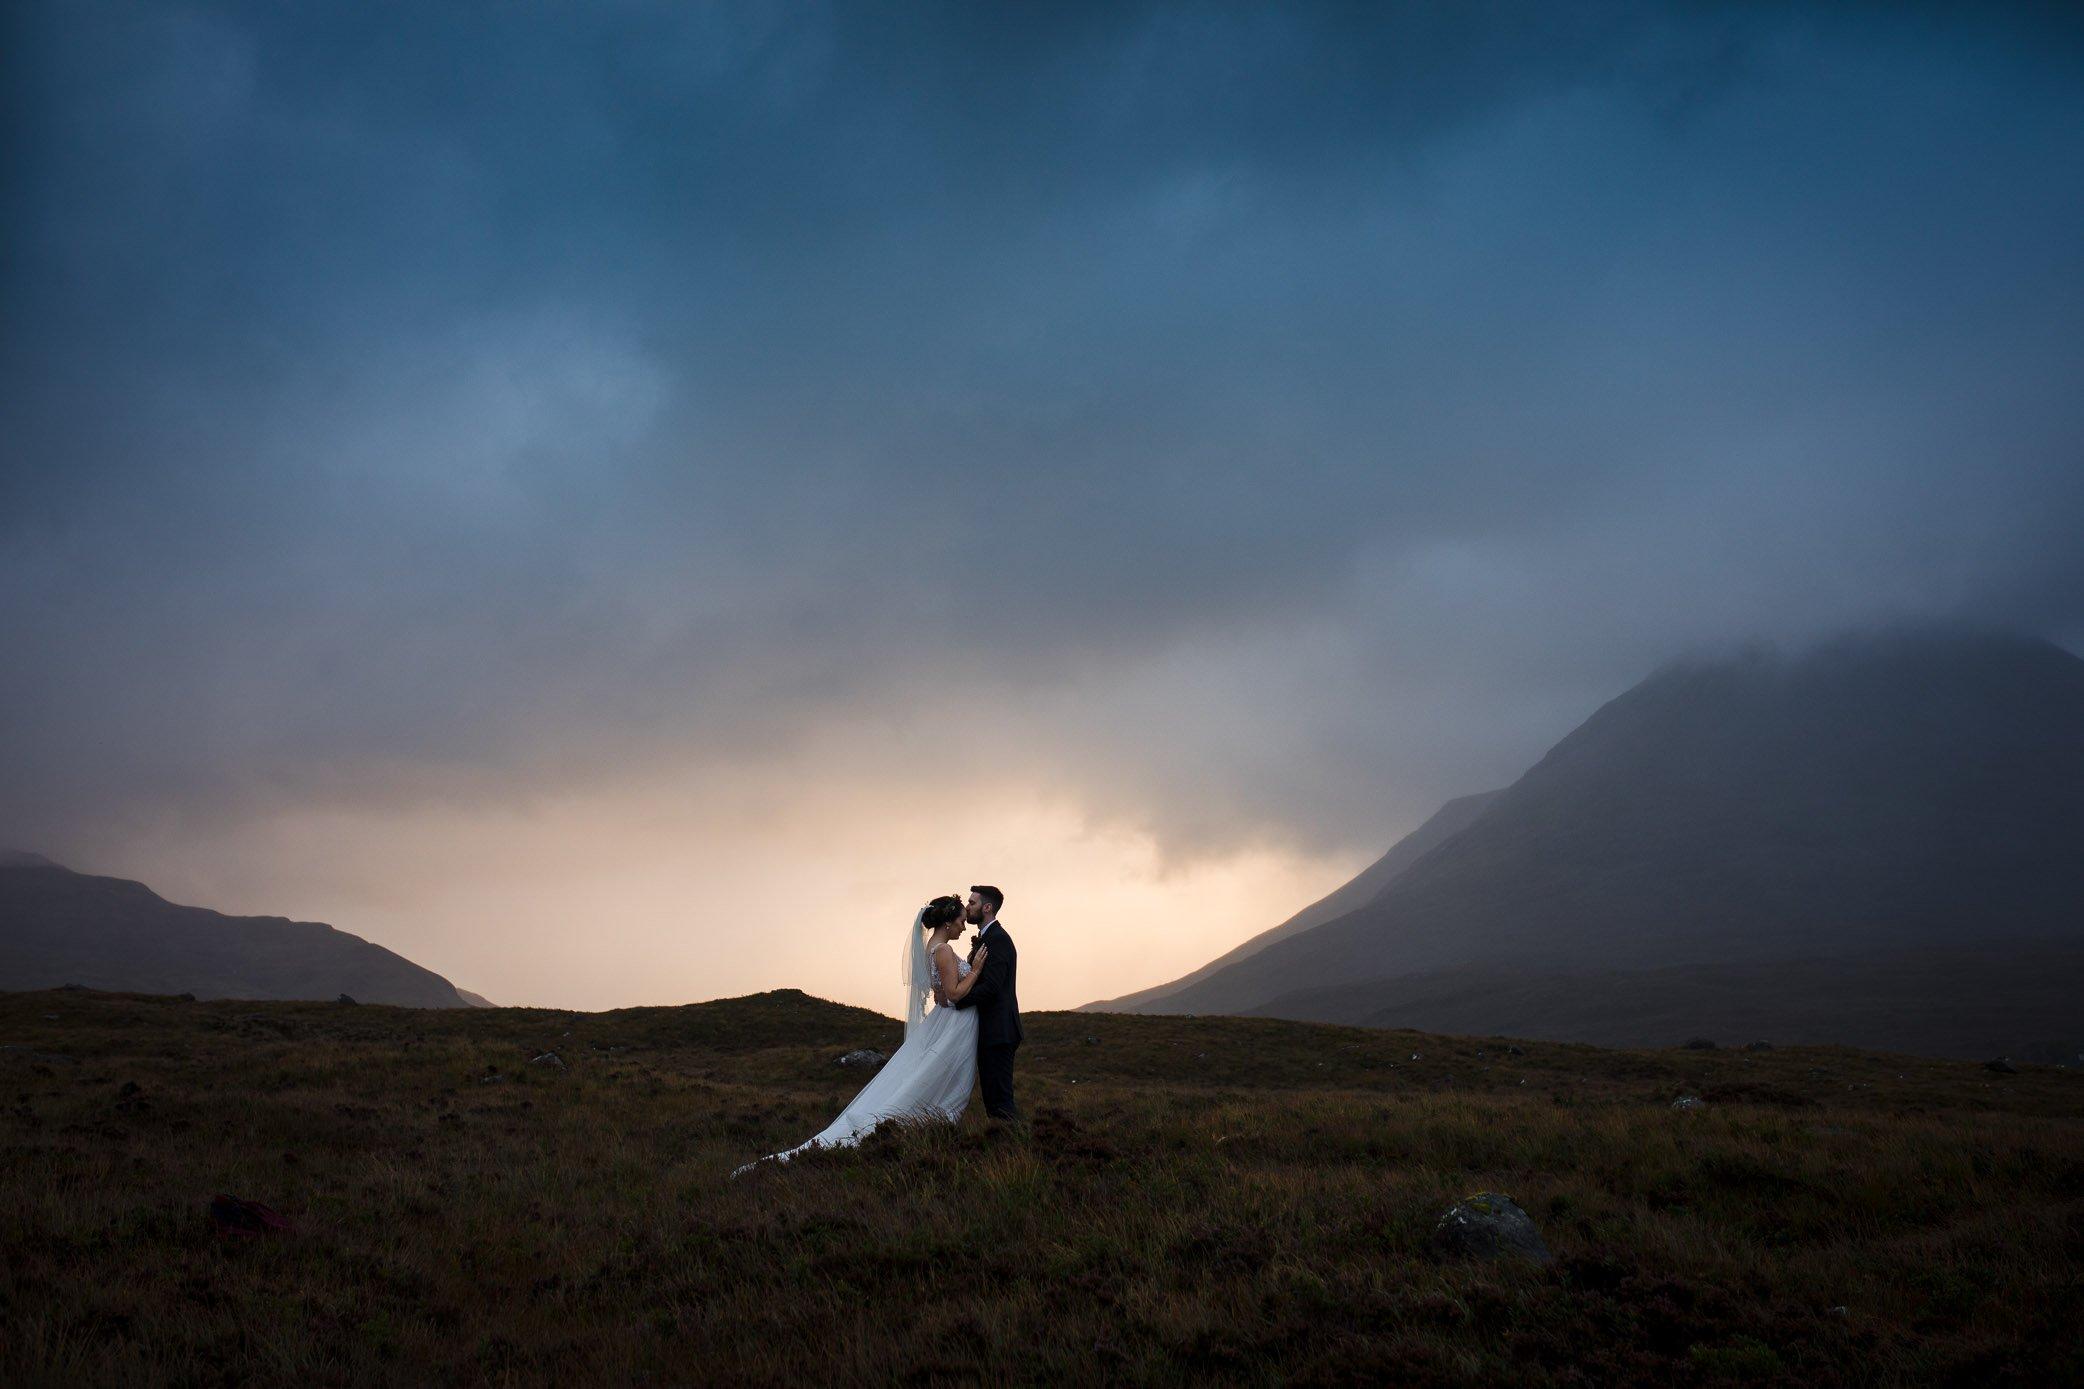 Wedding couple in landscape